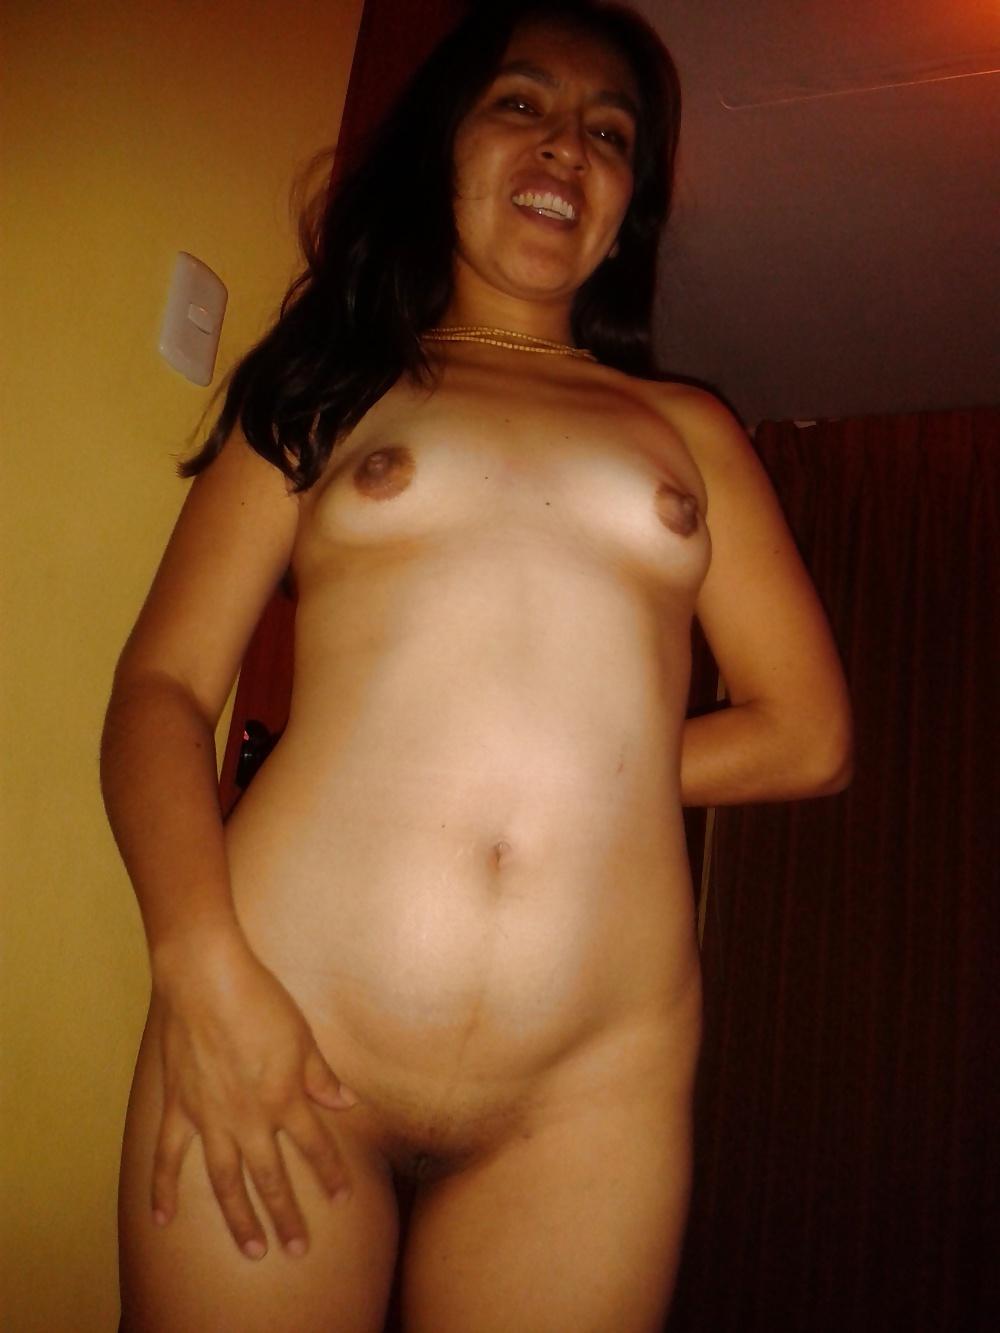 Chicas peru nude gallery